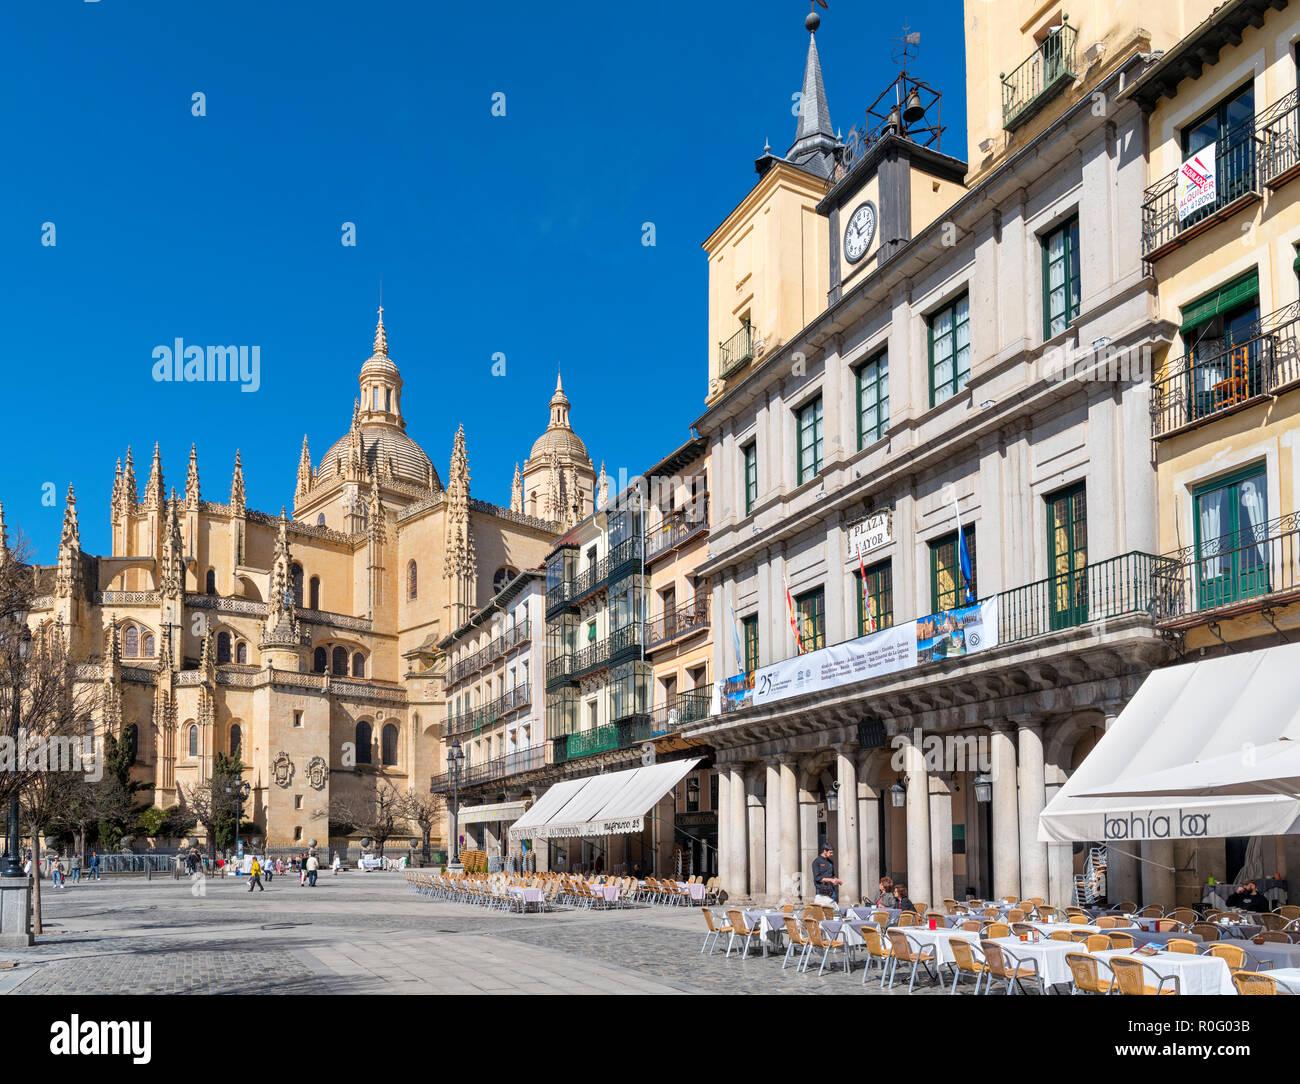 Plaza Mayor looking towards the Cathedral, Segovia, Castilla y Leon, Spain - Stock Image